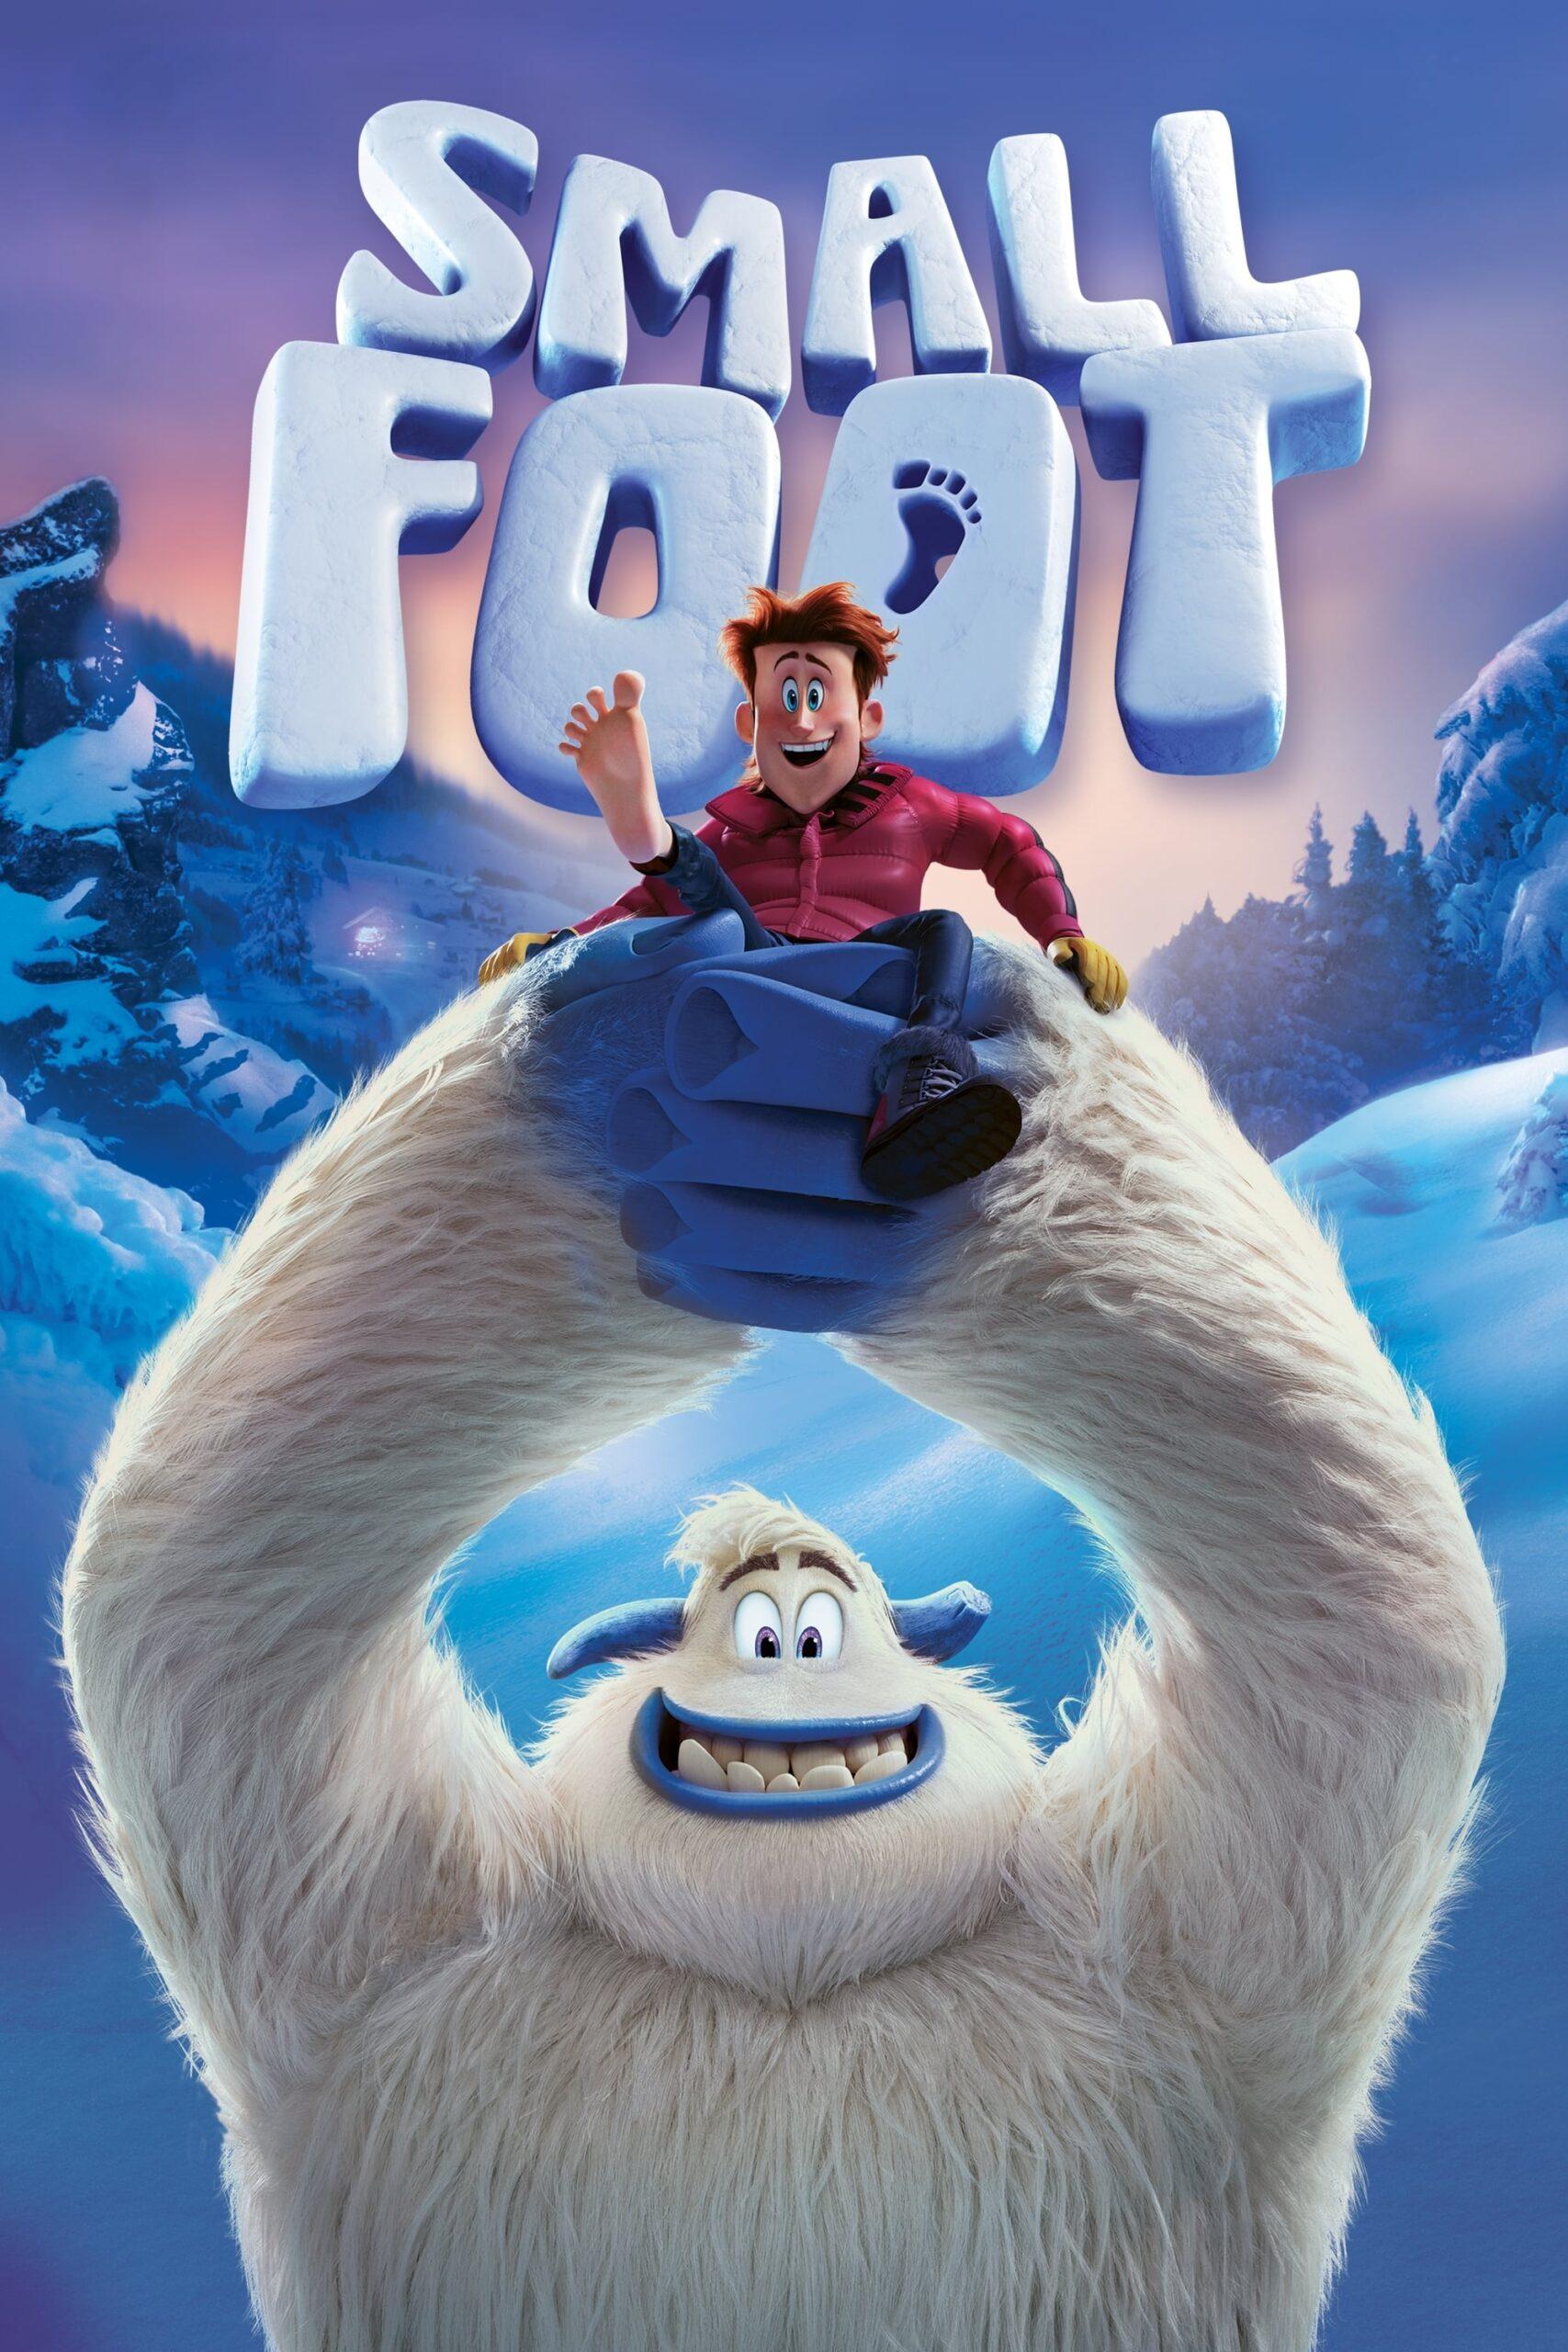 Smallfoot Movie Streaming Online Watch on Google Play, Hungama, Netflix , Tata Sky , Youtube, iTunes